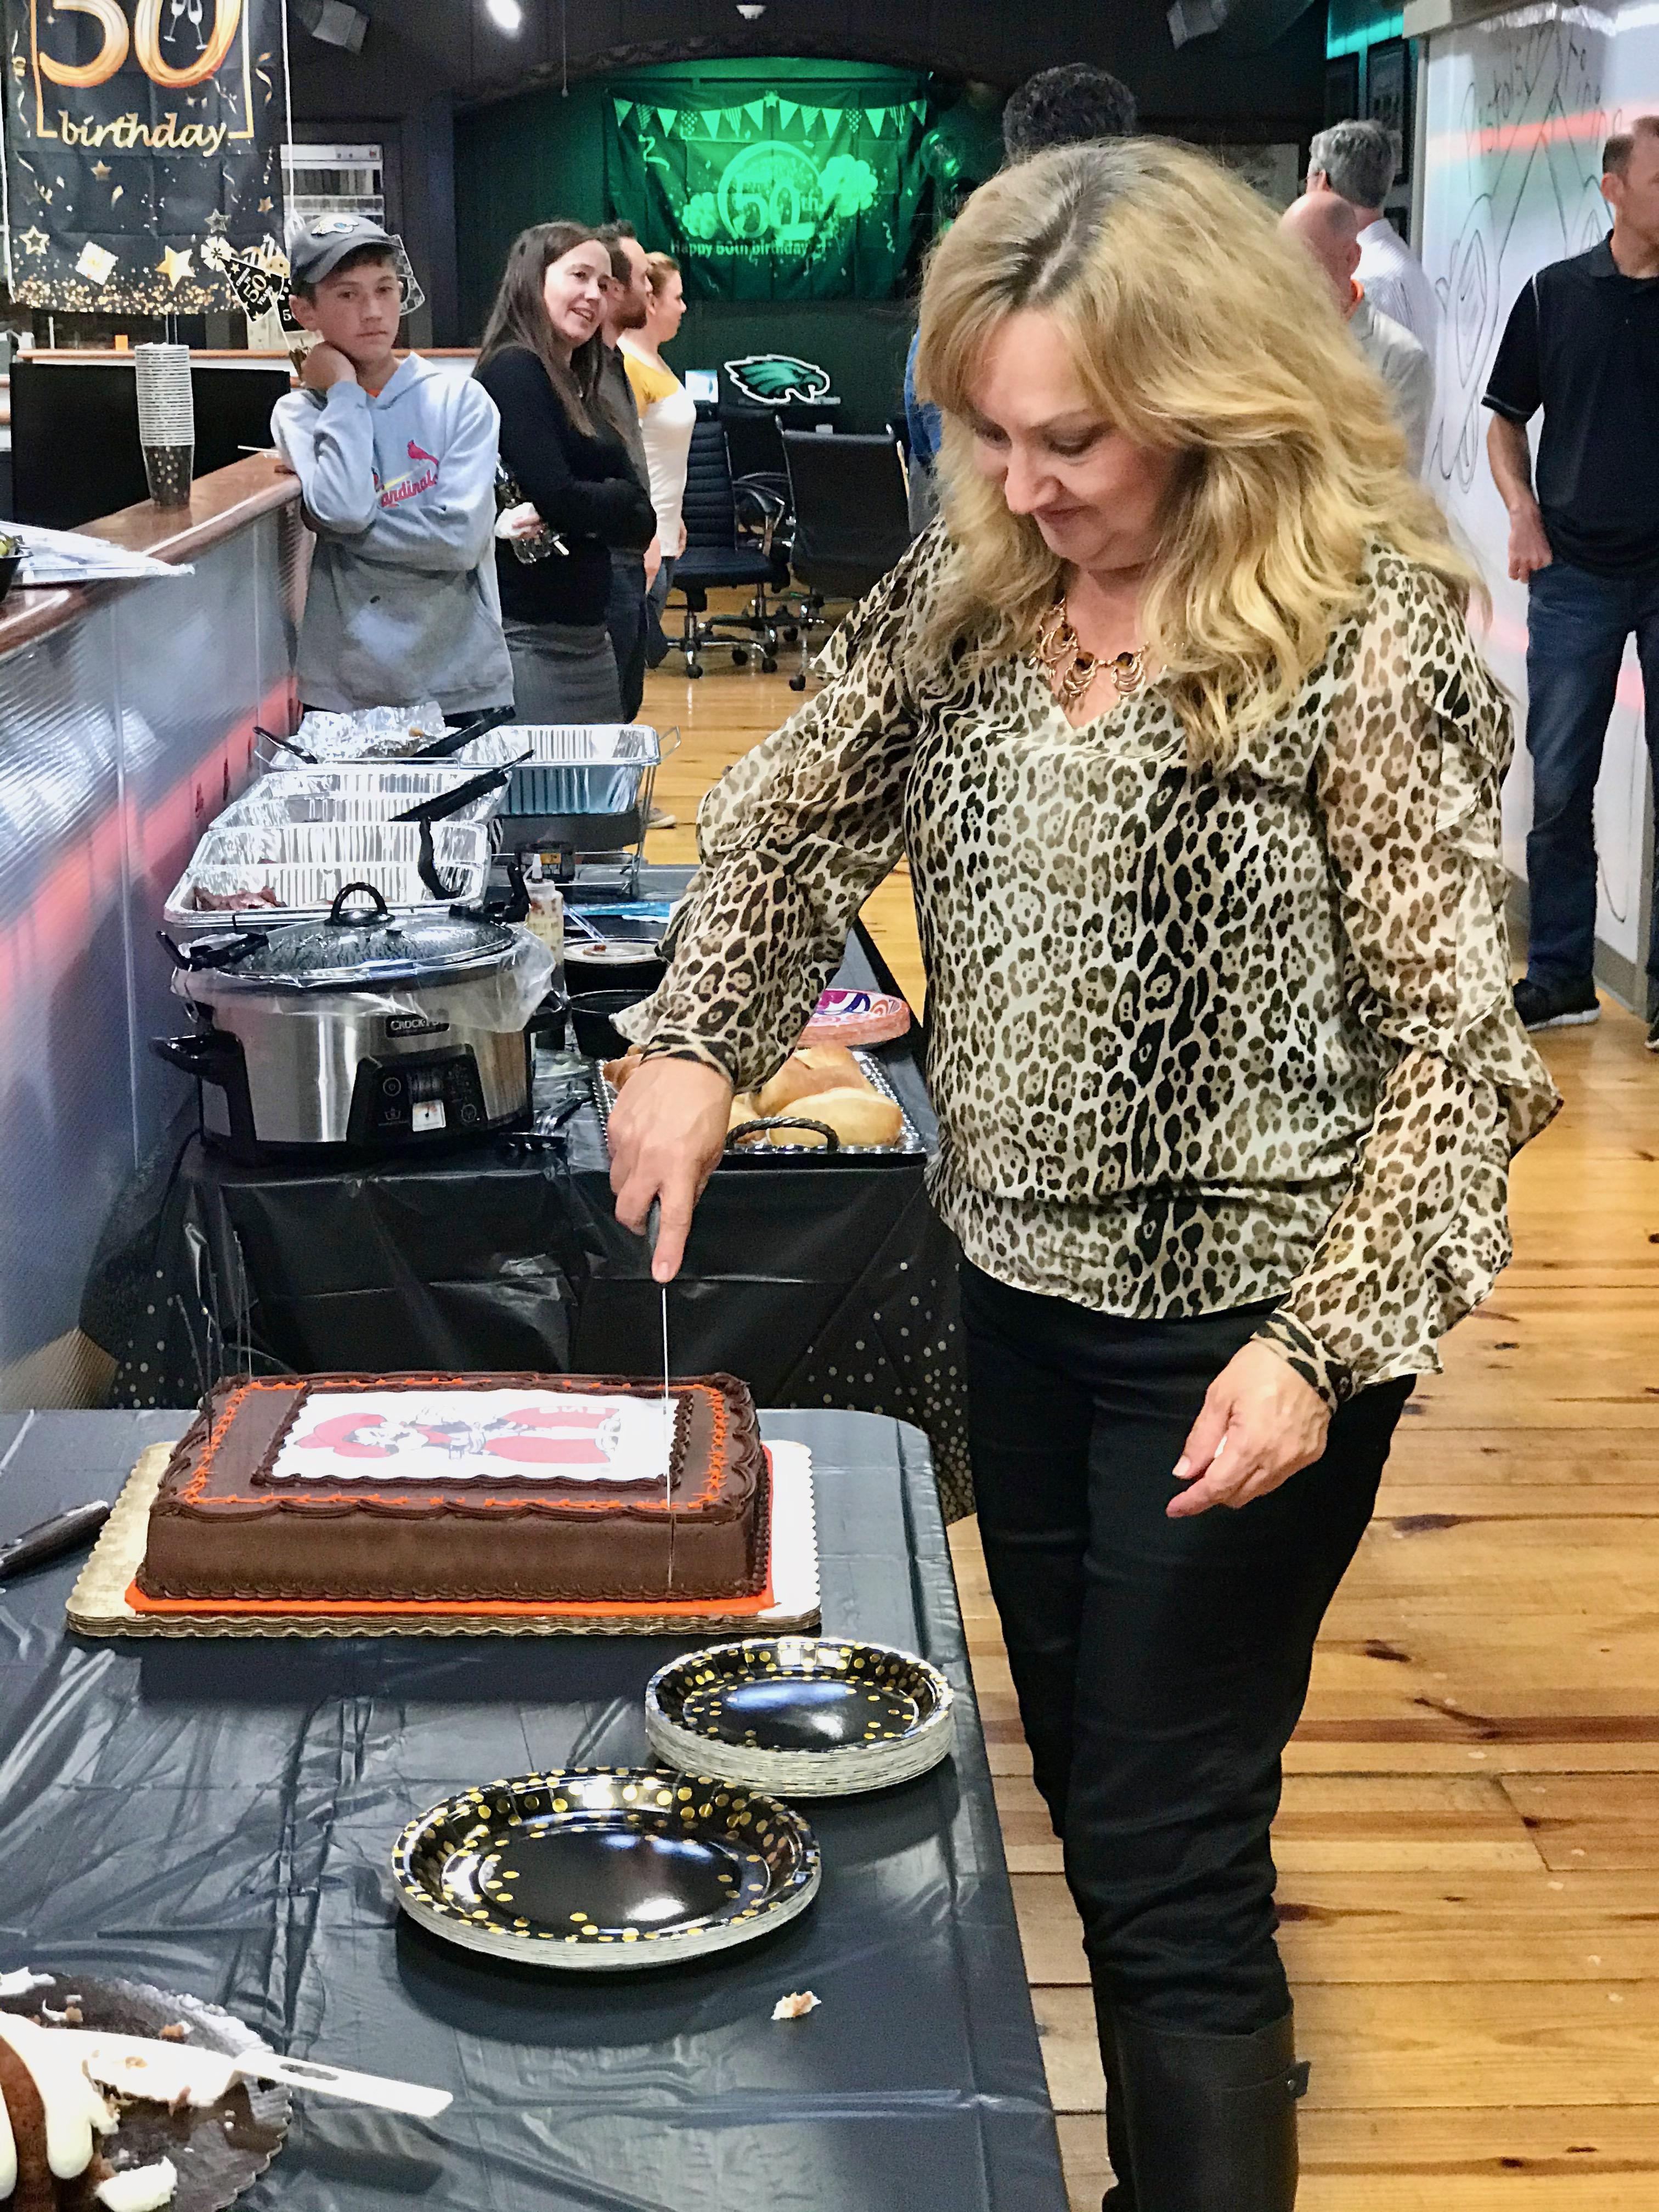 Cutting the birthday cake!